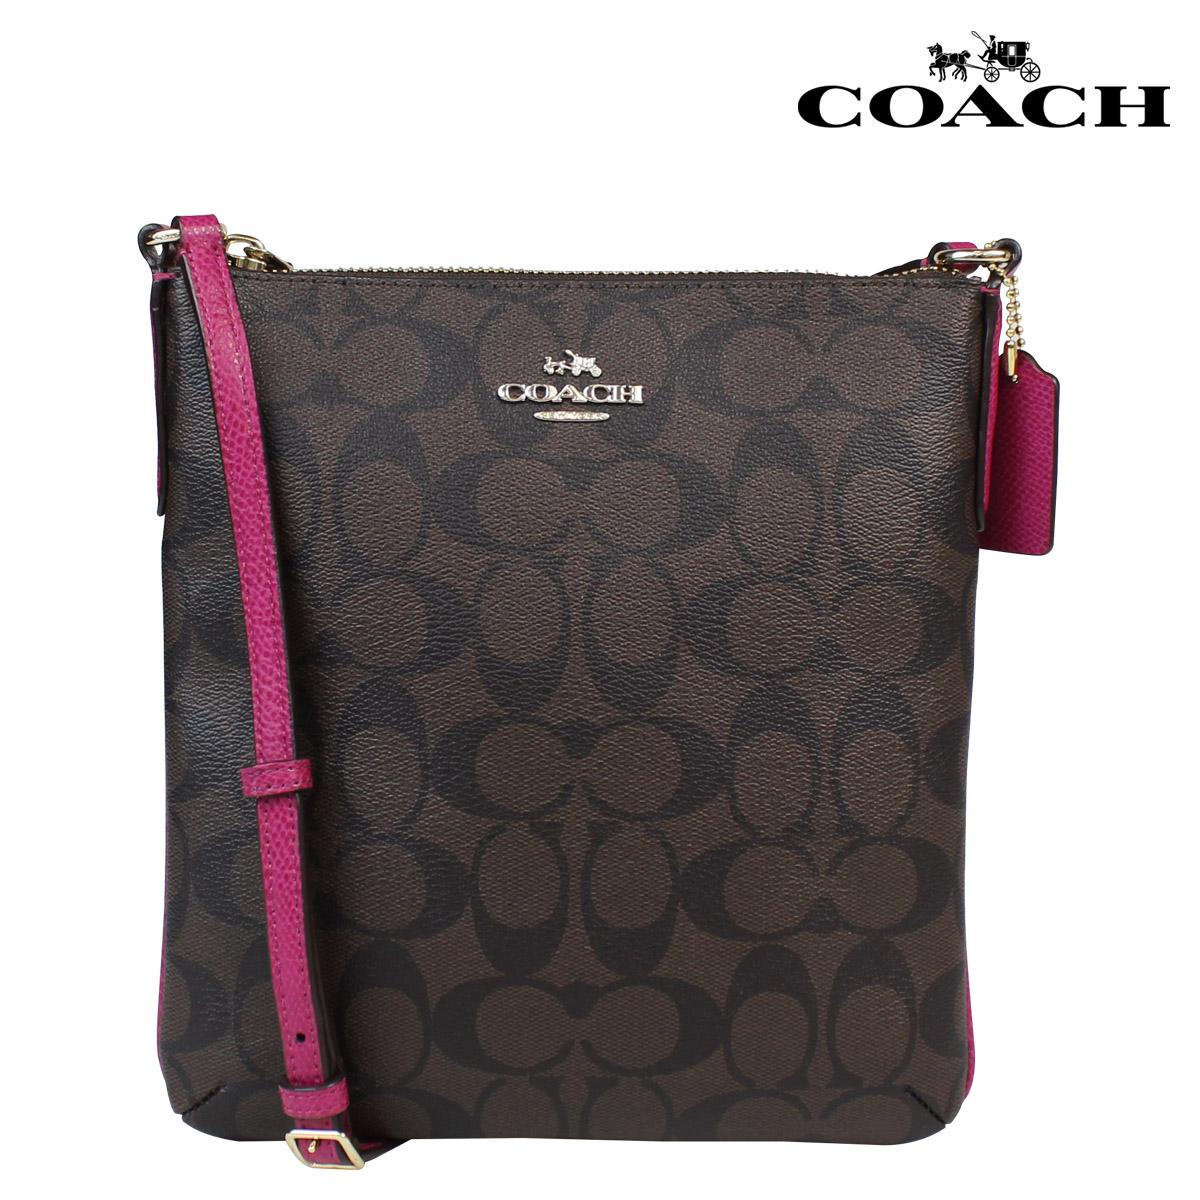 11445e00e639 Coach COACH women s shoulder bag F35940 Brown x Cranberry signature NS  cross body  12   1 new in stock